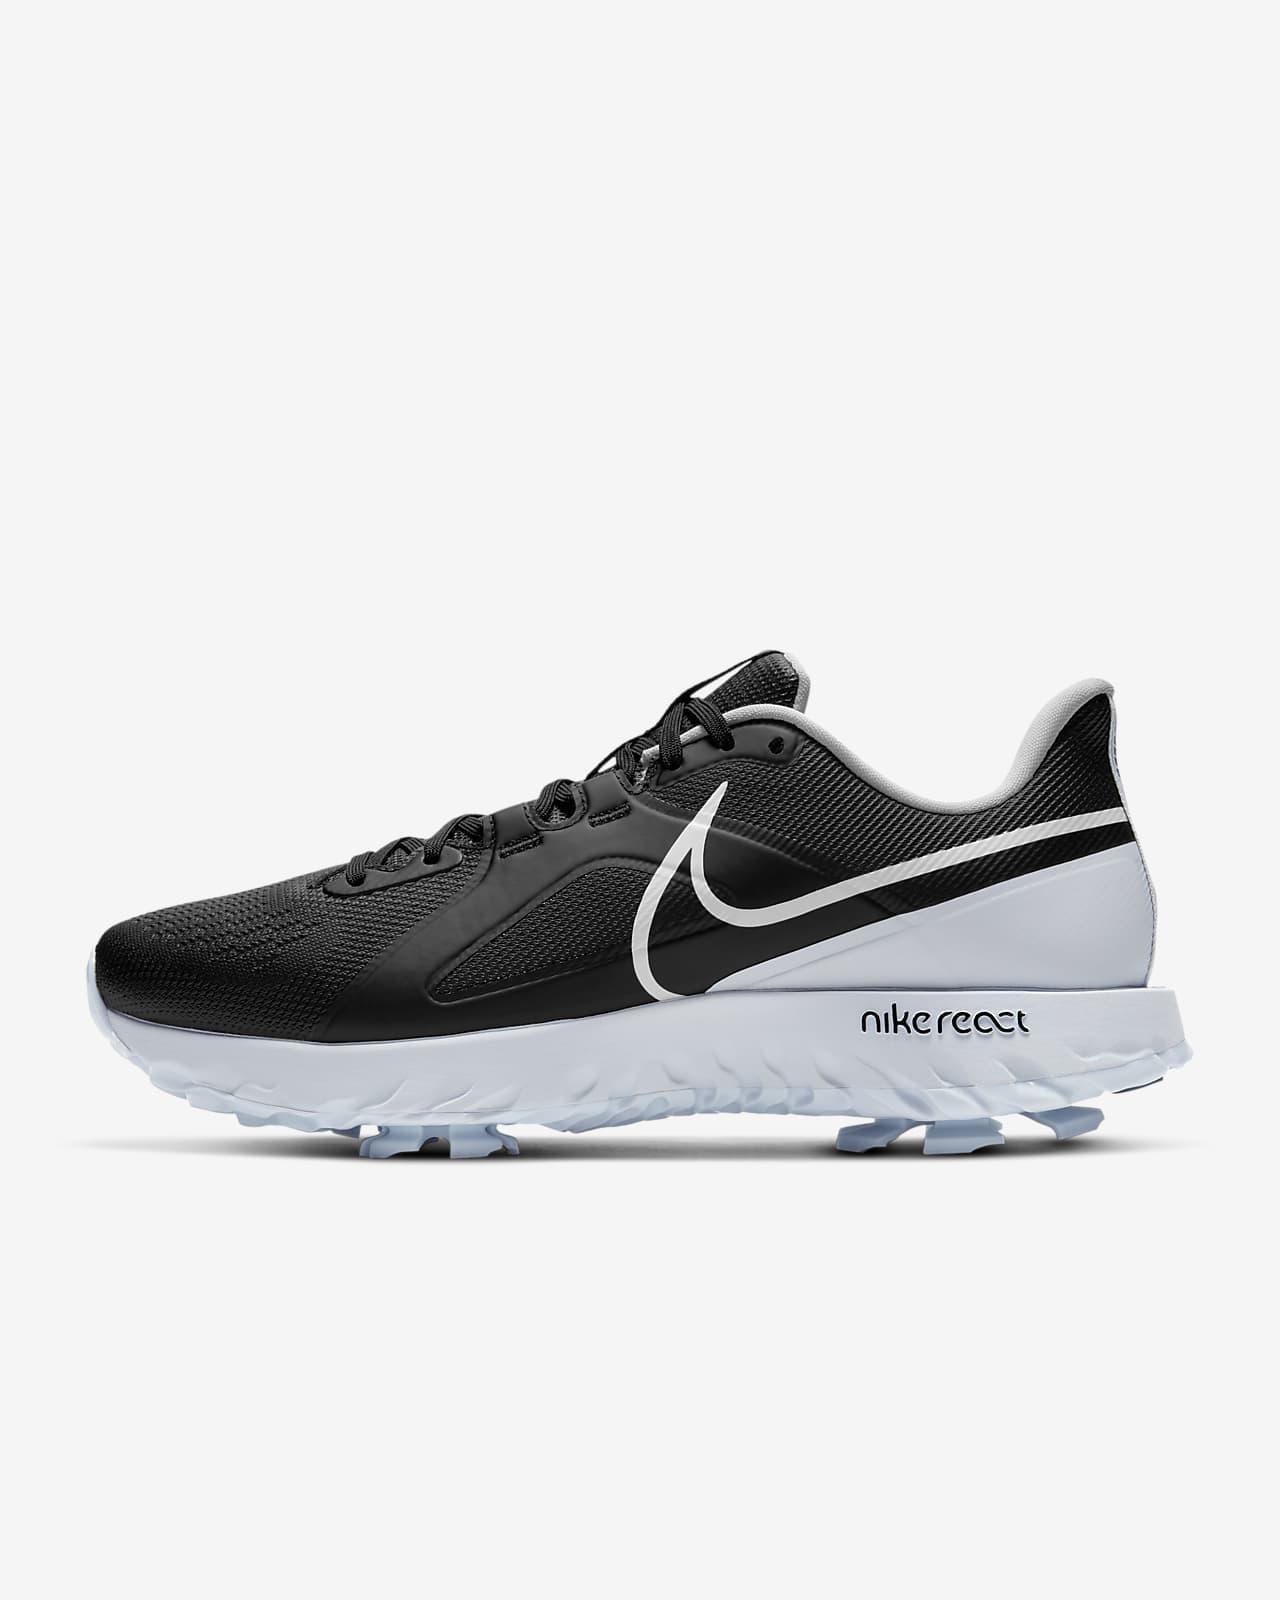 Nike React Infinity Pro golf sko